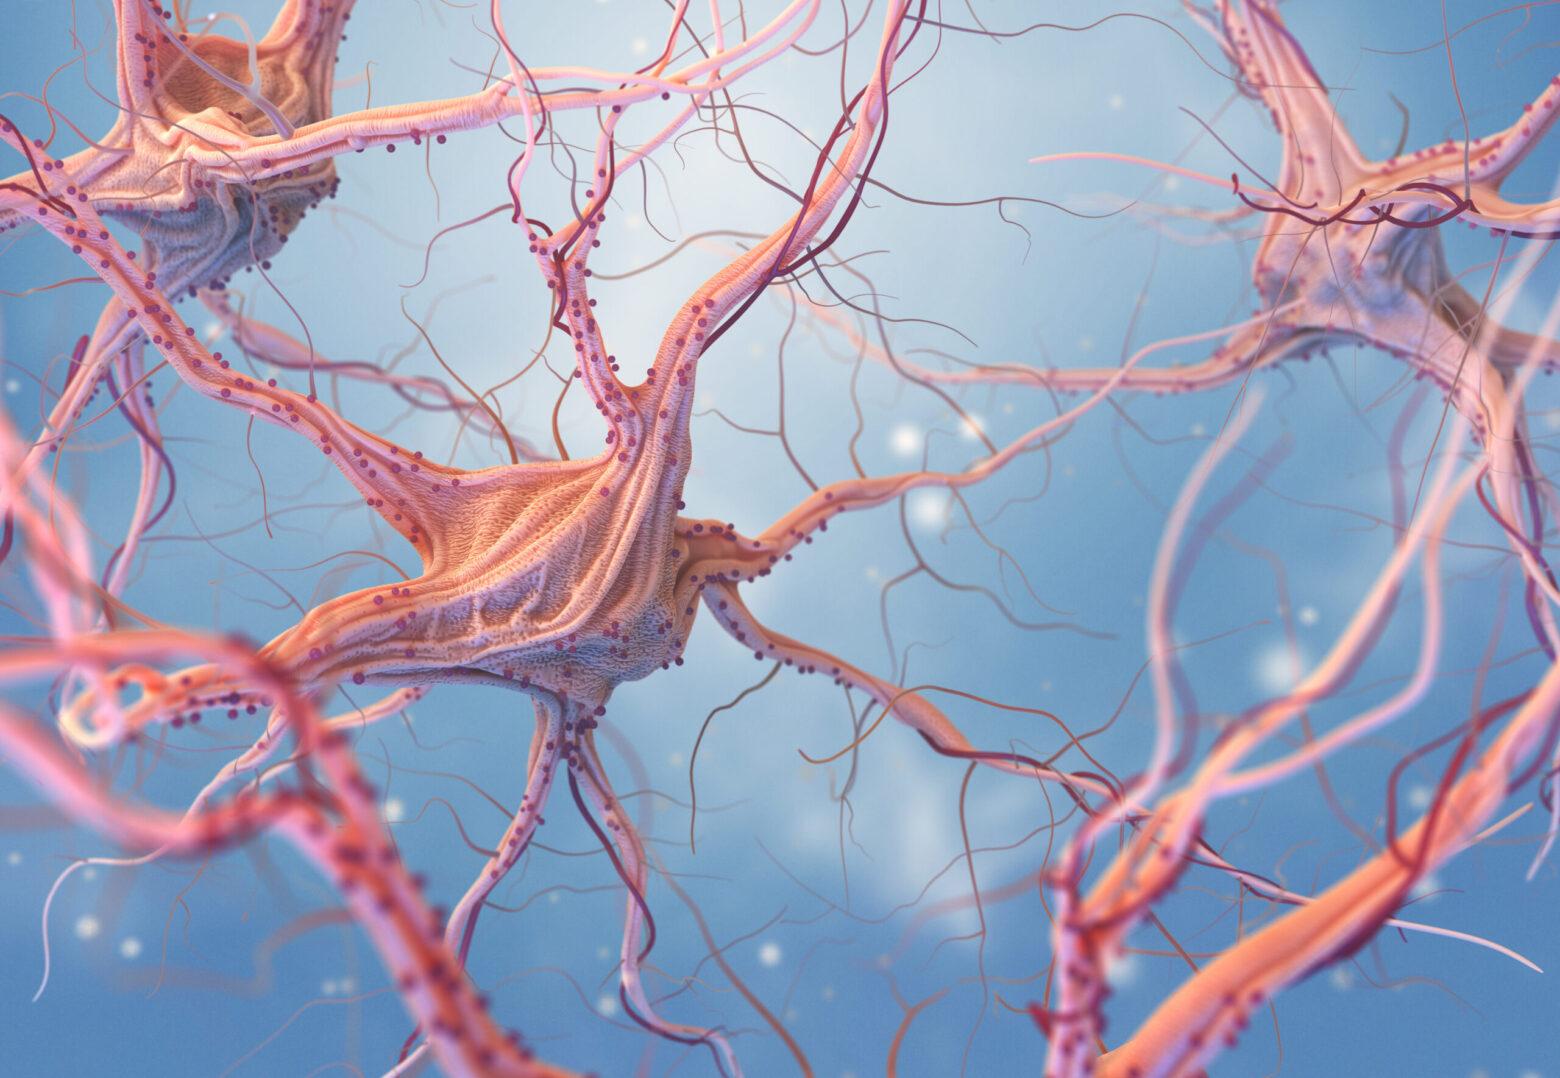 Autonomic and Spinal Theranostics